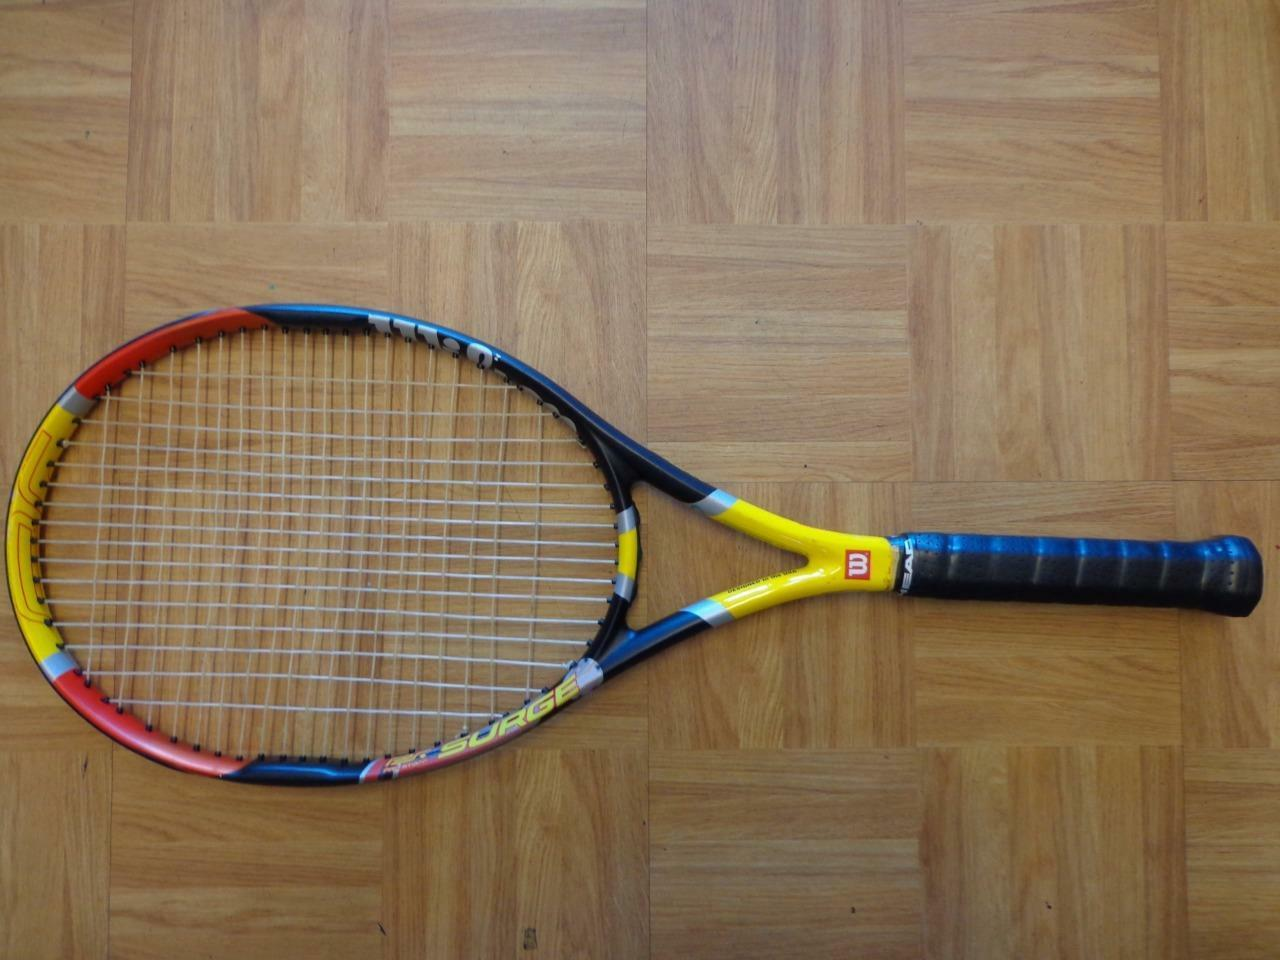 Wilson Hyper Pro Staff 5.1 Surge 100 Head 4 1 2 grip raquette de tennis